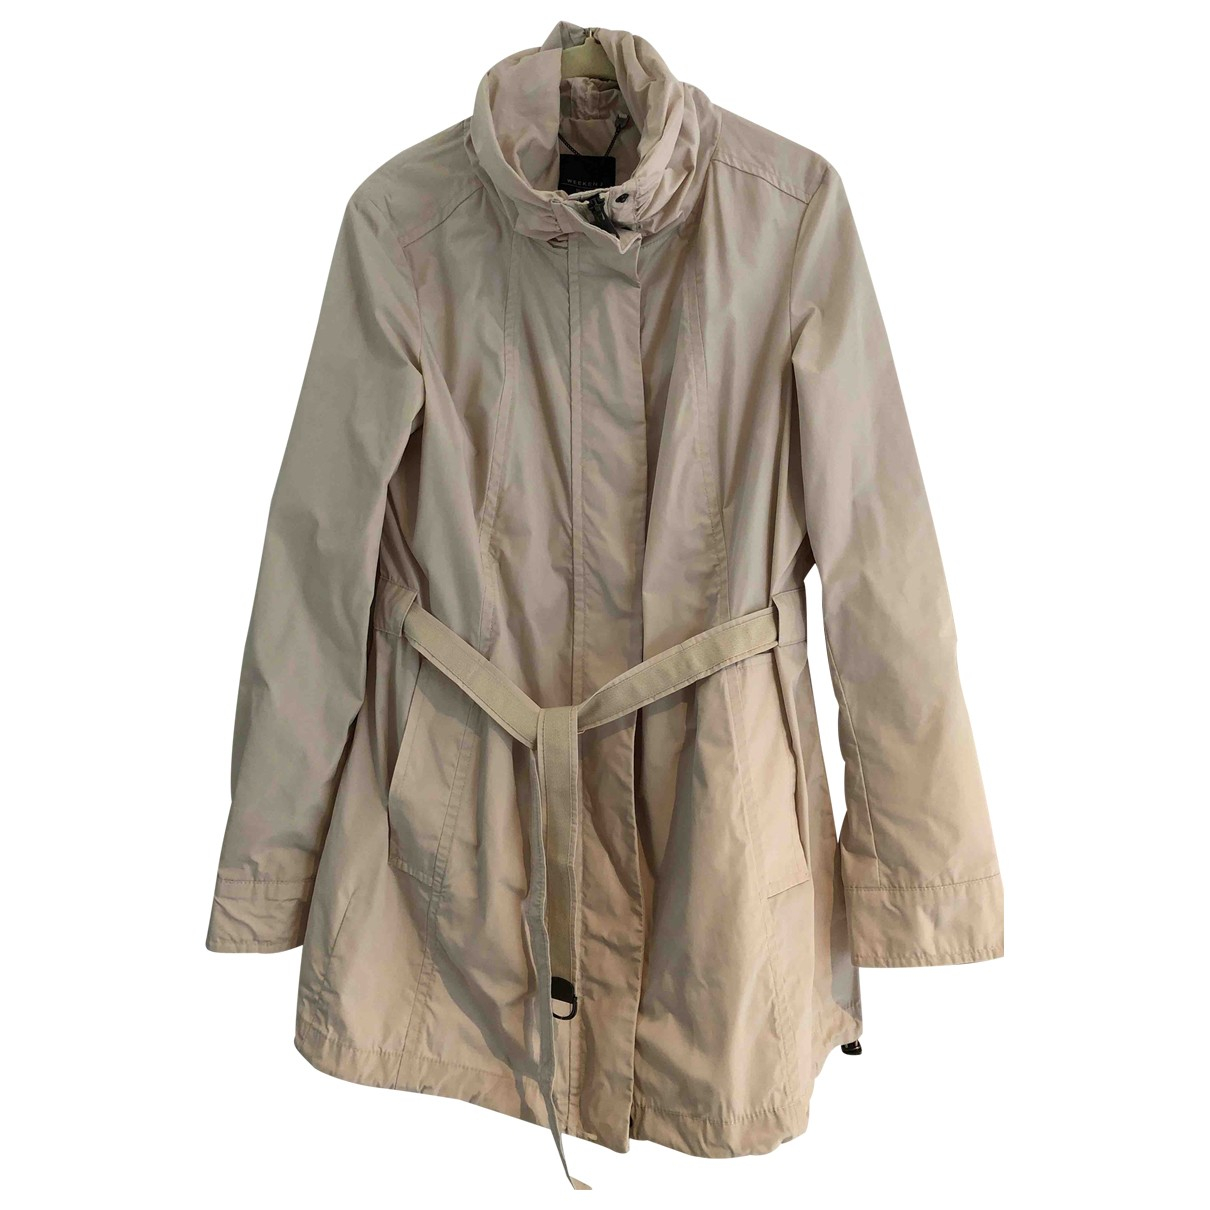 Max Mara Weekend N Beige coat for Women 8 UK